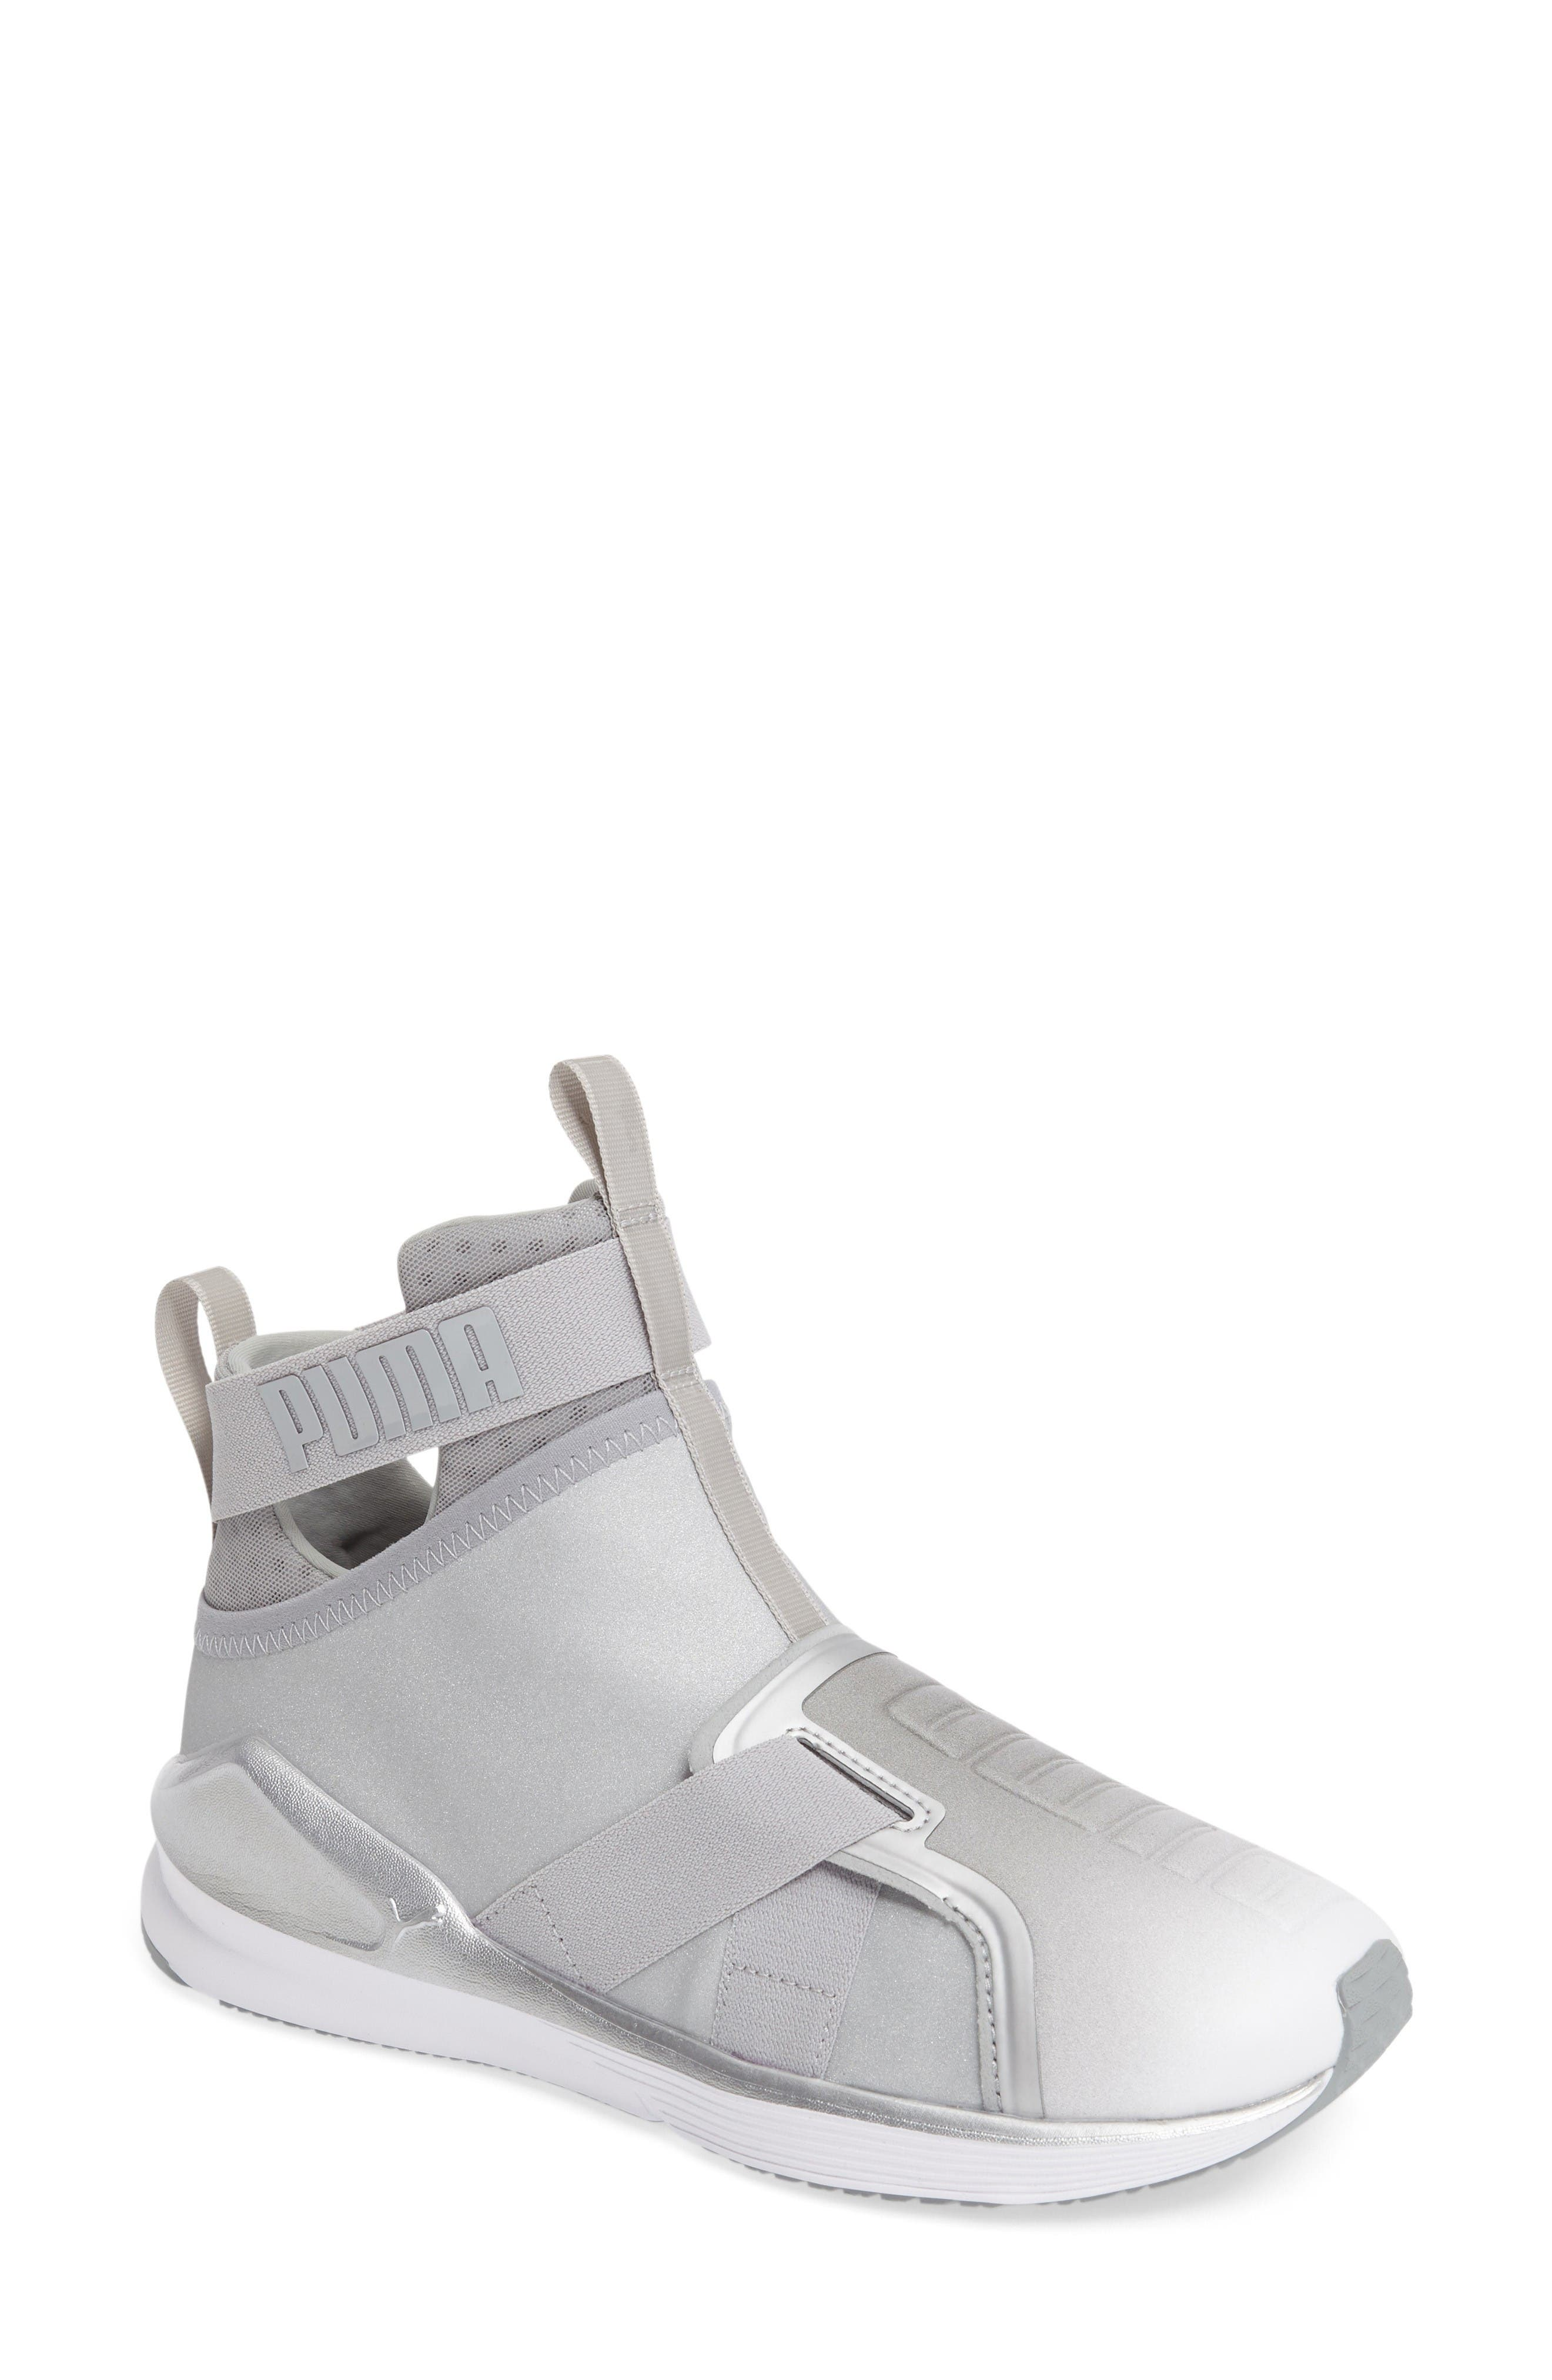 PUMA Fierce High Top Sneaker (Women)